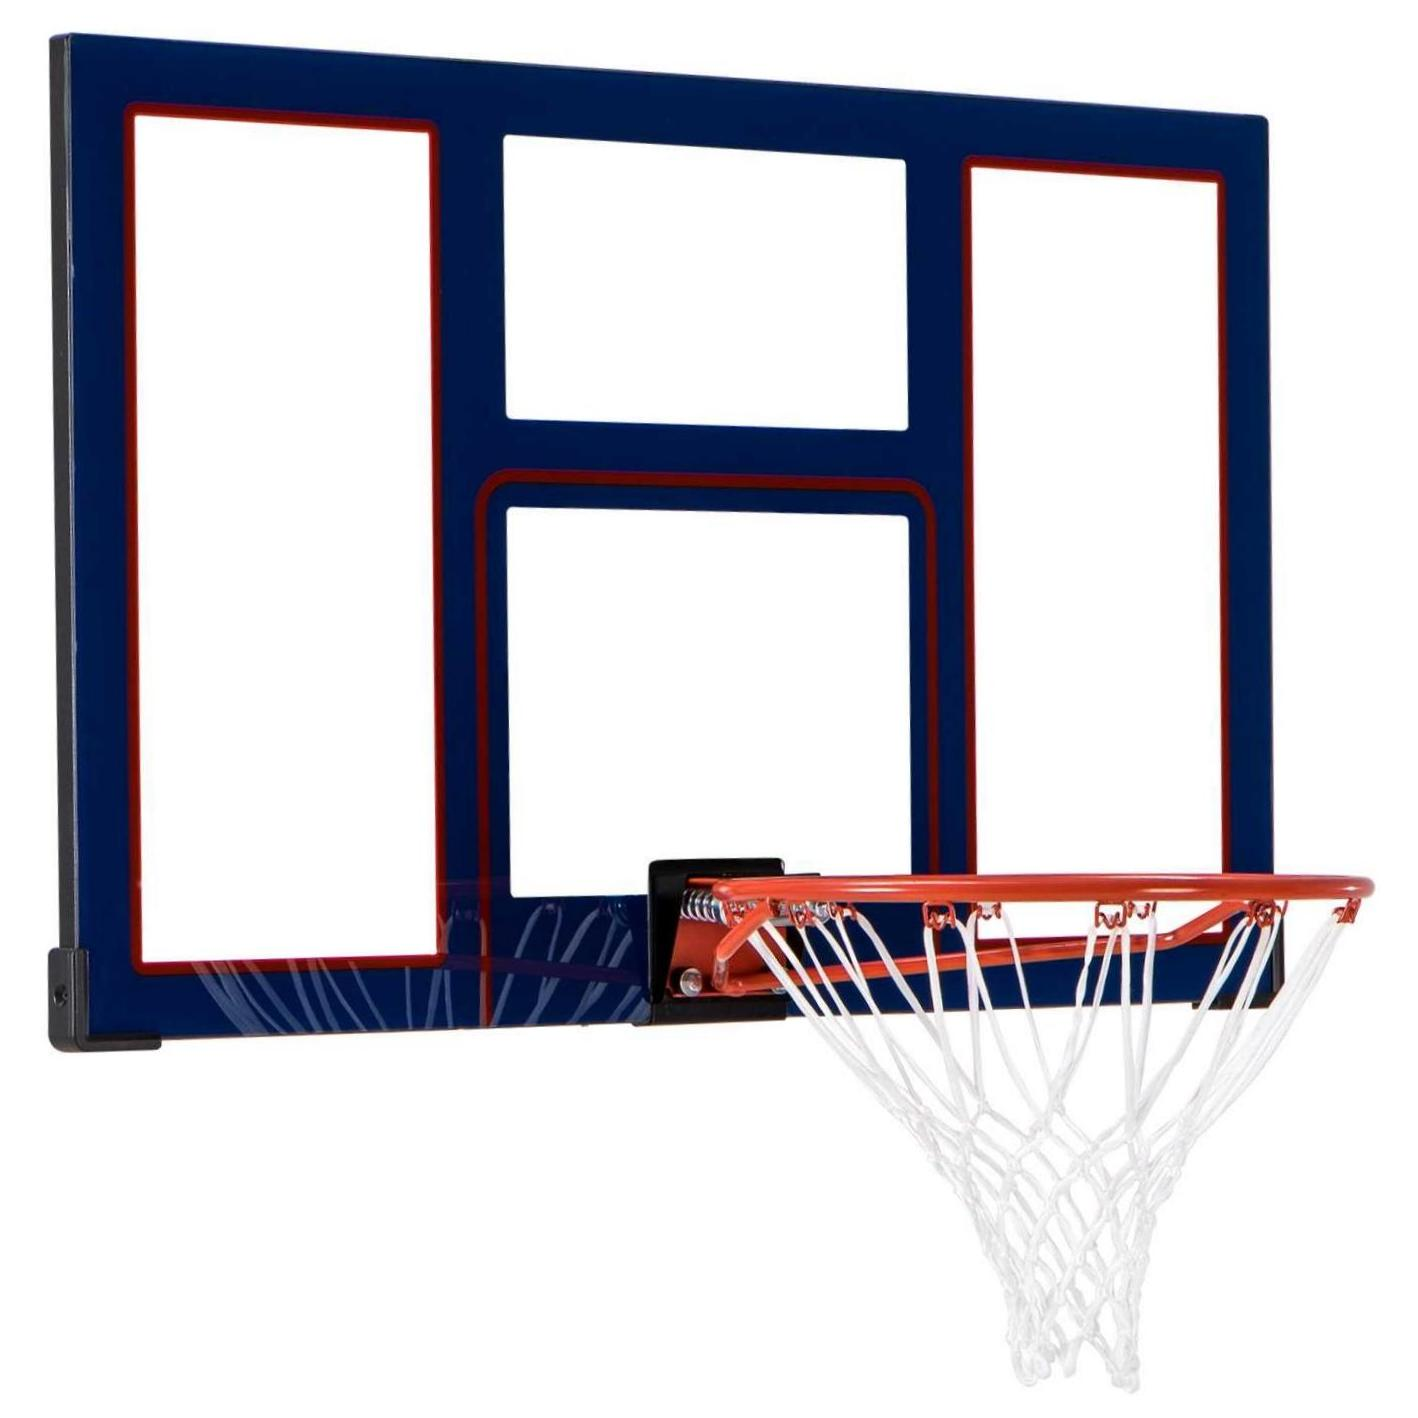 panier de basket mural sp cial dunk garantie de 5 ans. Black Bedroom Furniture Sets. Home Design Ideas